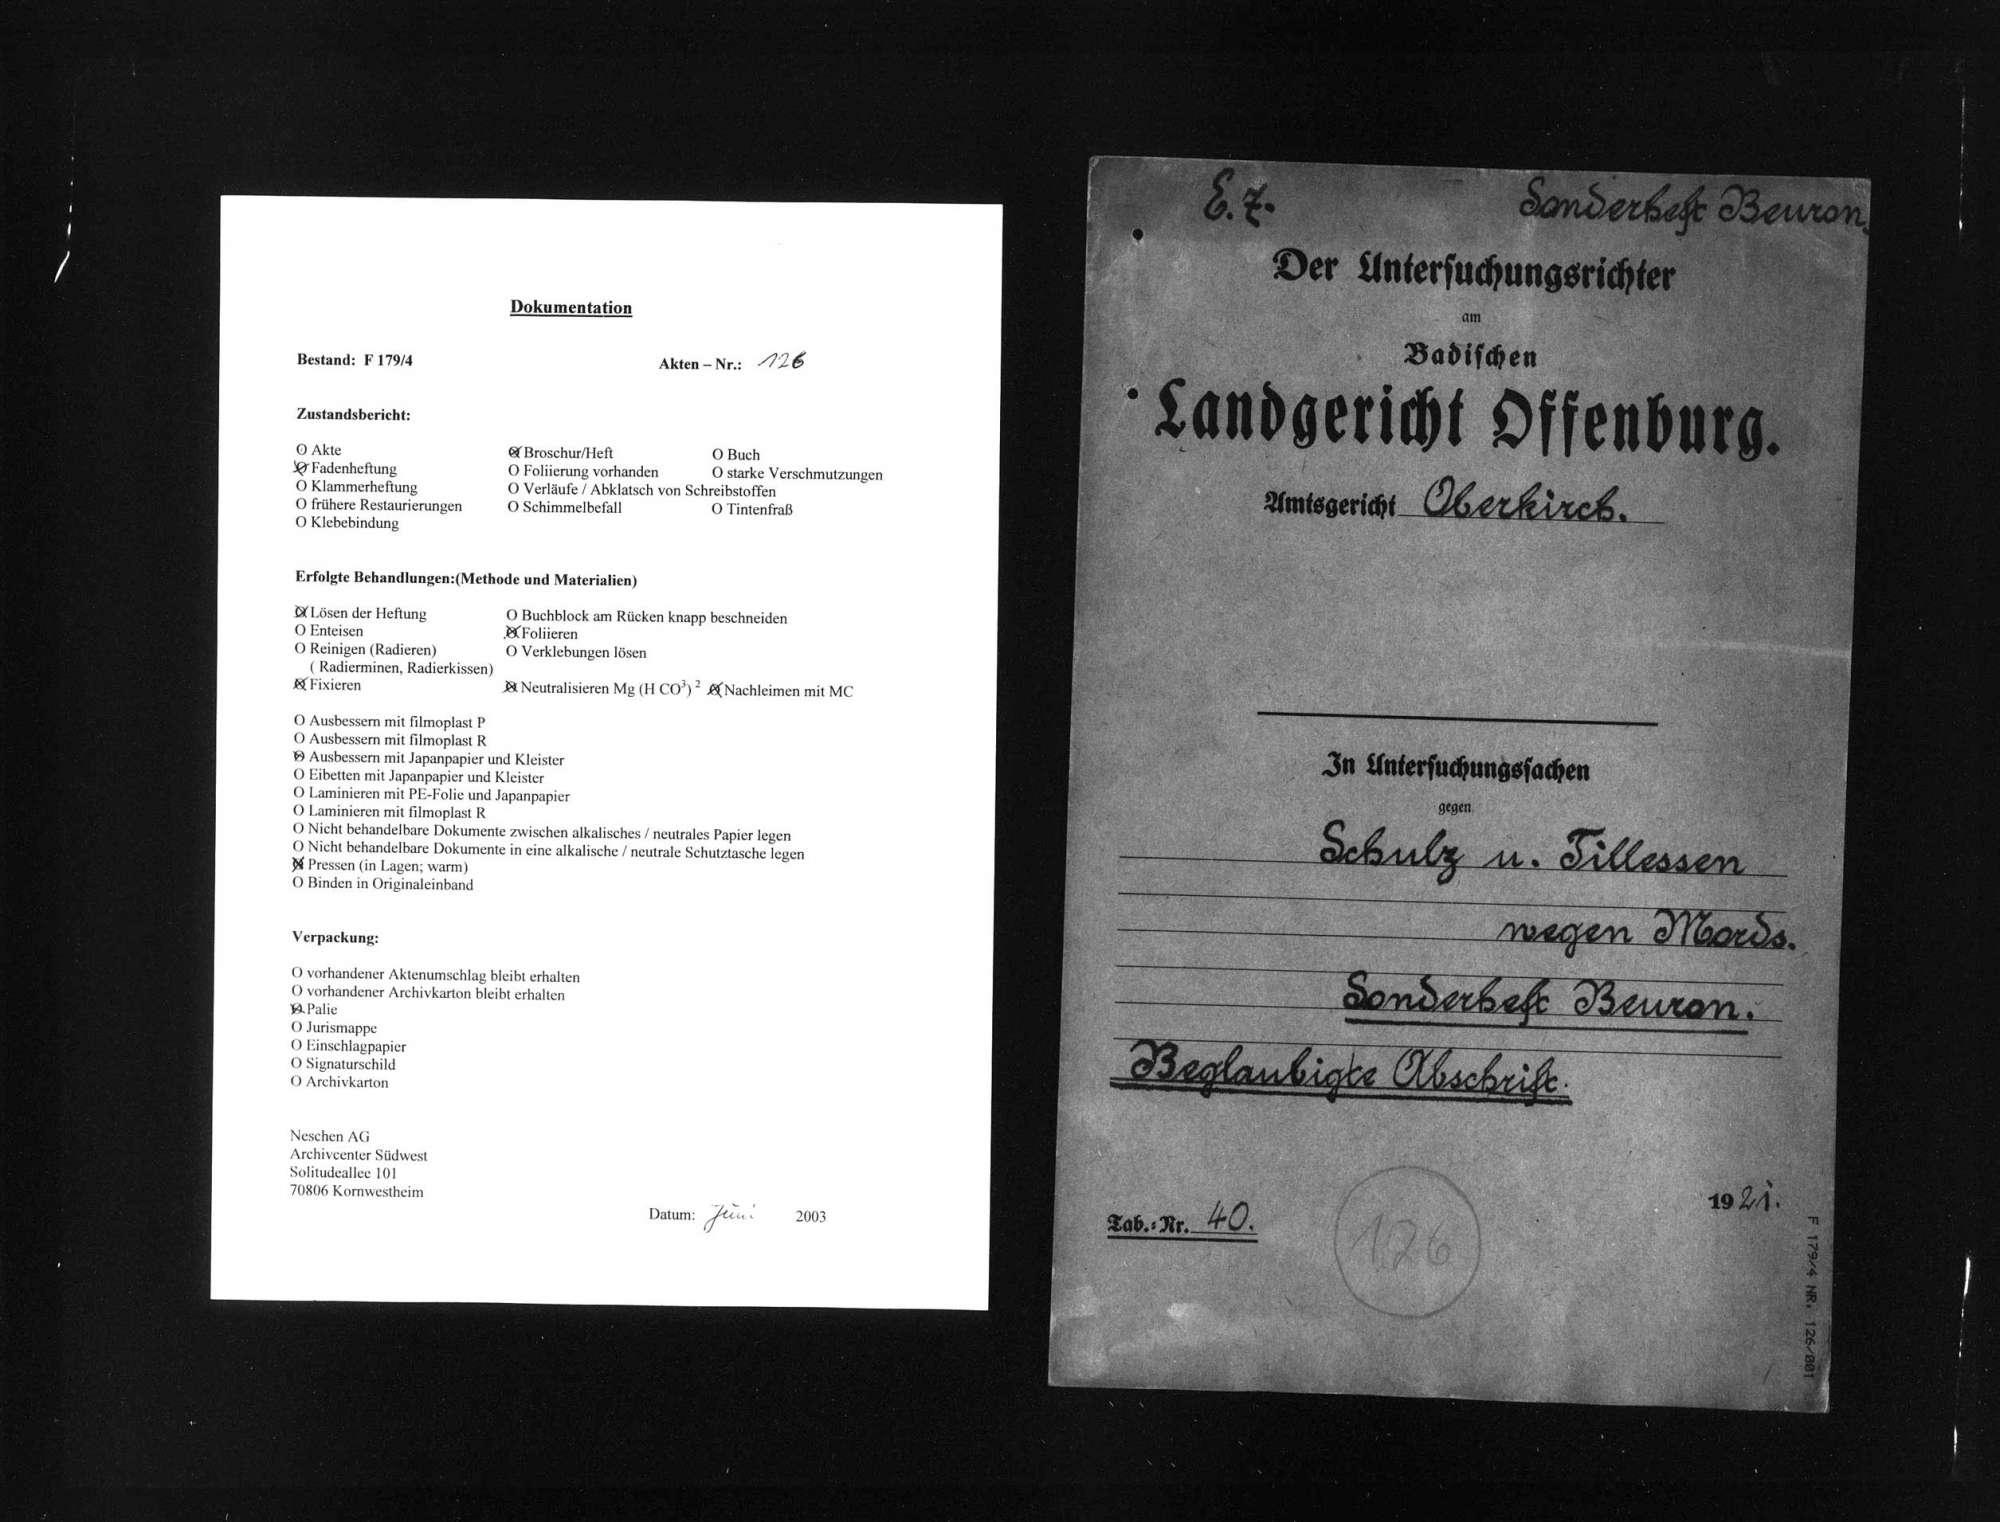 Untersuchungsakten -Sonderheft Beuron (beglaubigte Abschrift), Bild 1